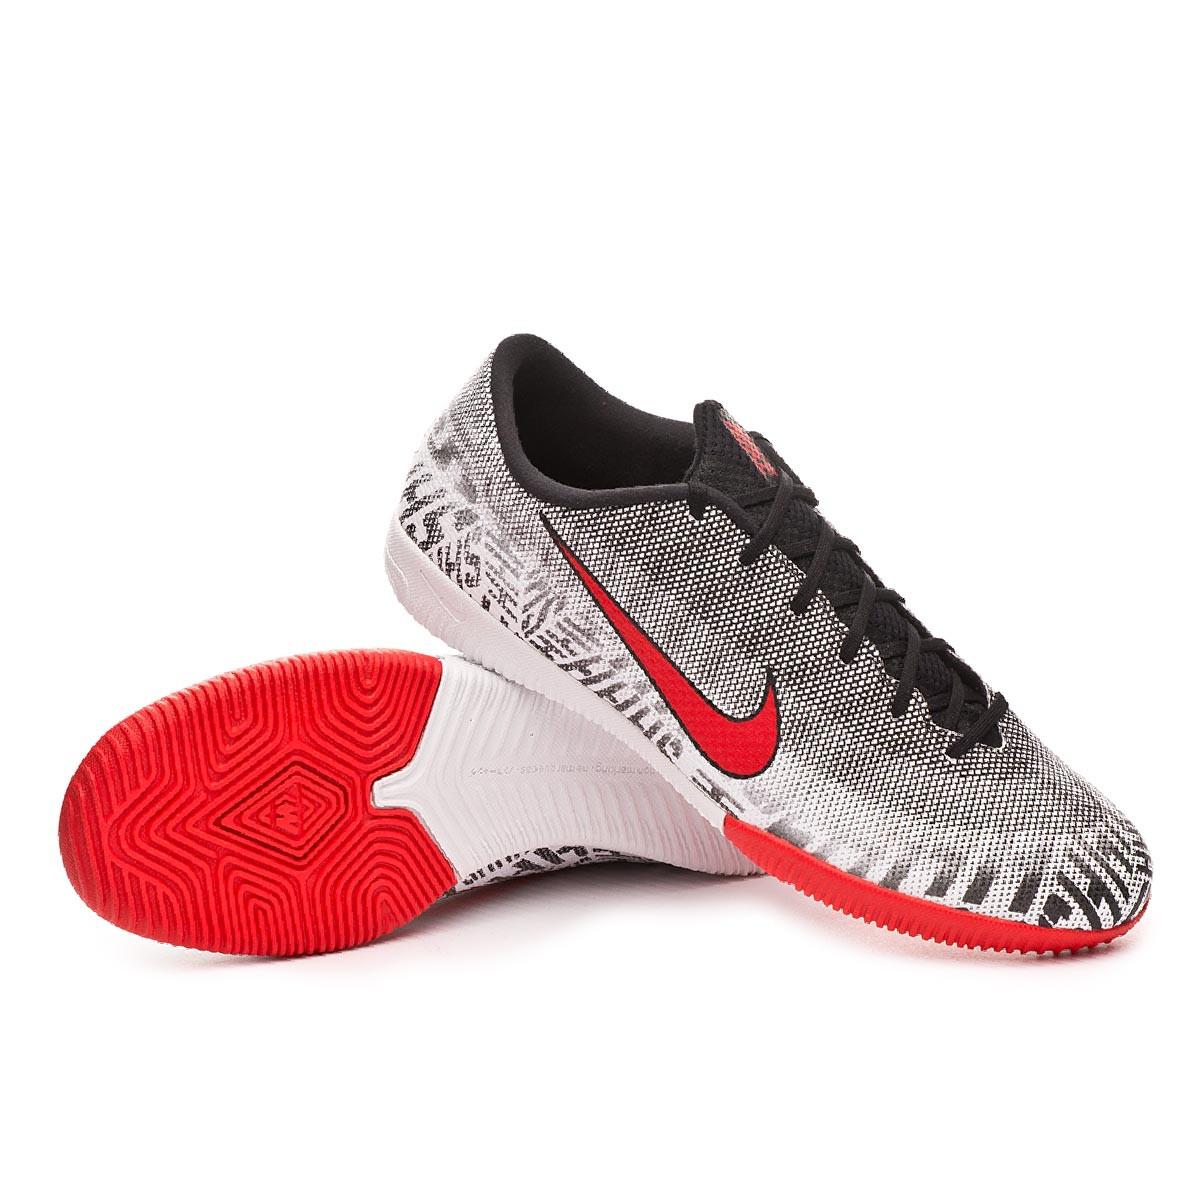 a9573d15ca5 Futsal Boot Nike Mercurial VaporX XII Academy Neymar Jr IC White-Challenge  red-Black - Football store Fútbol Emotion